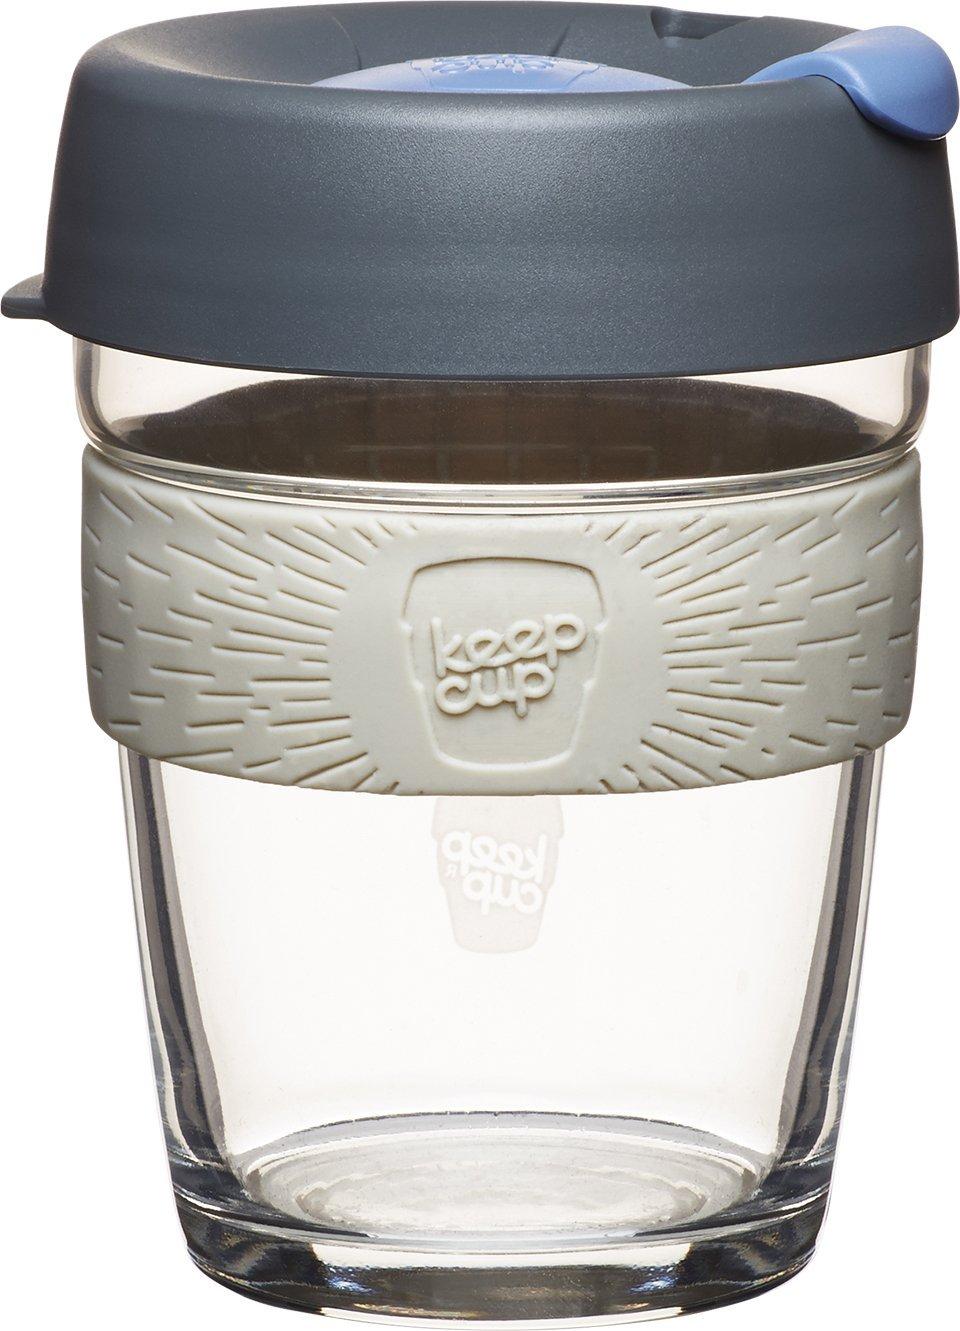 keep-cup-silver.jpg